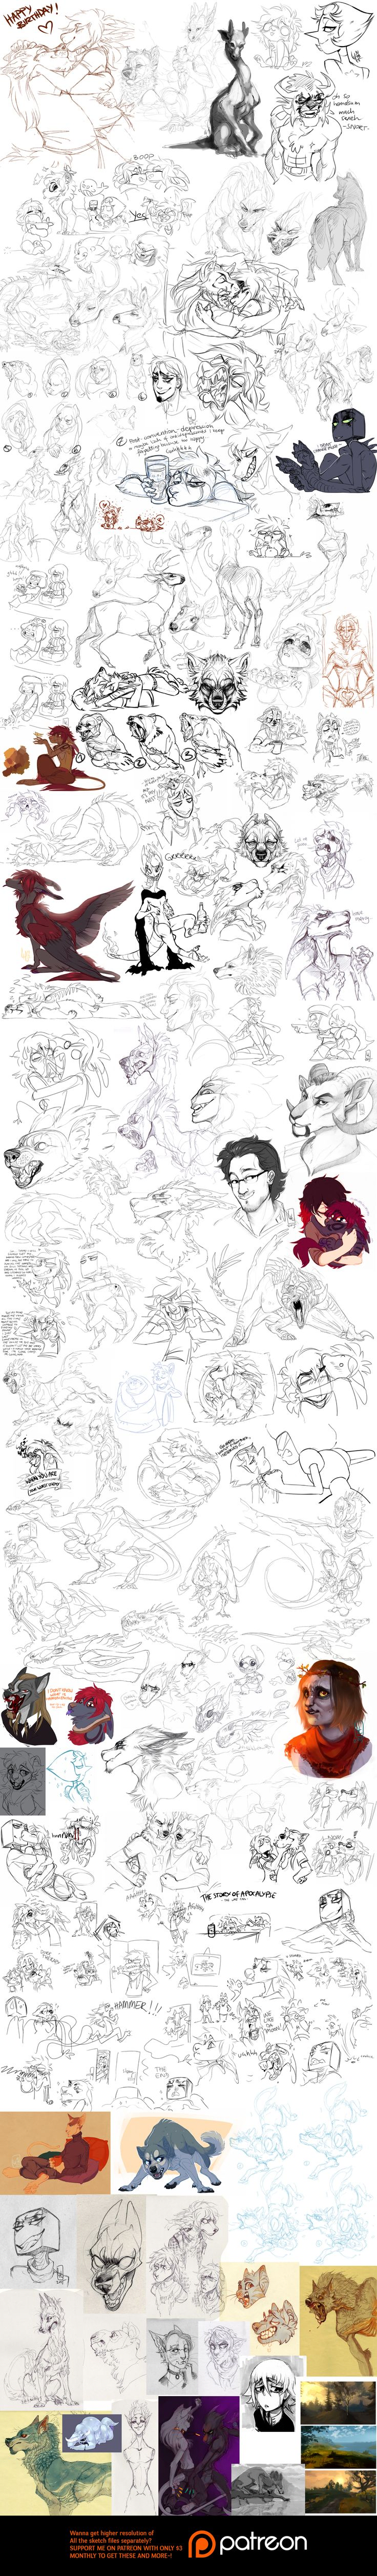 Sketch dump 61 by LiLaiRa on DeviantArt